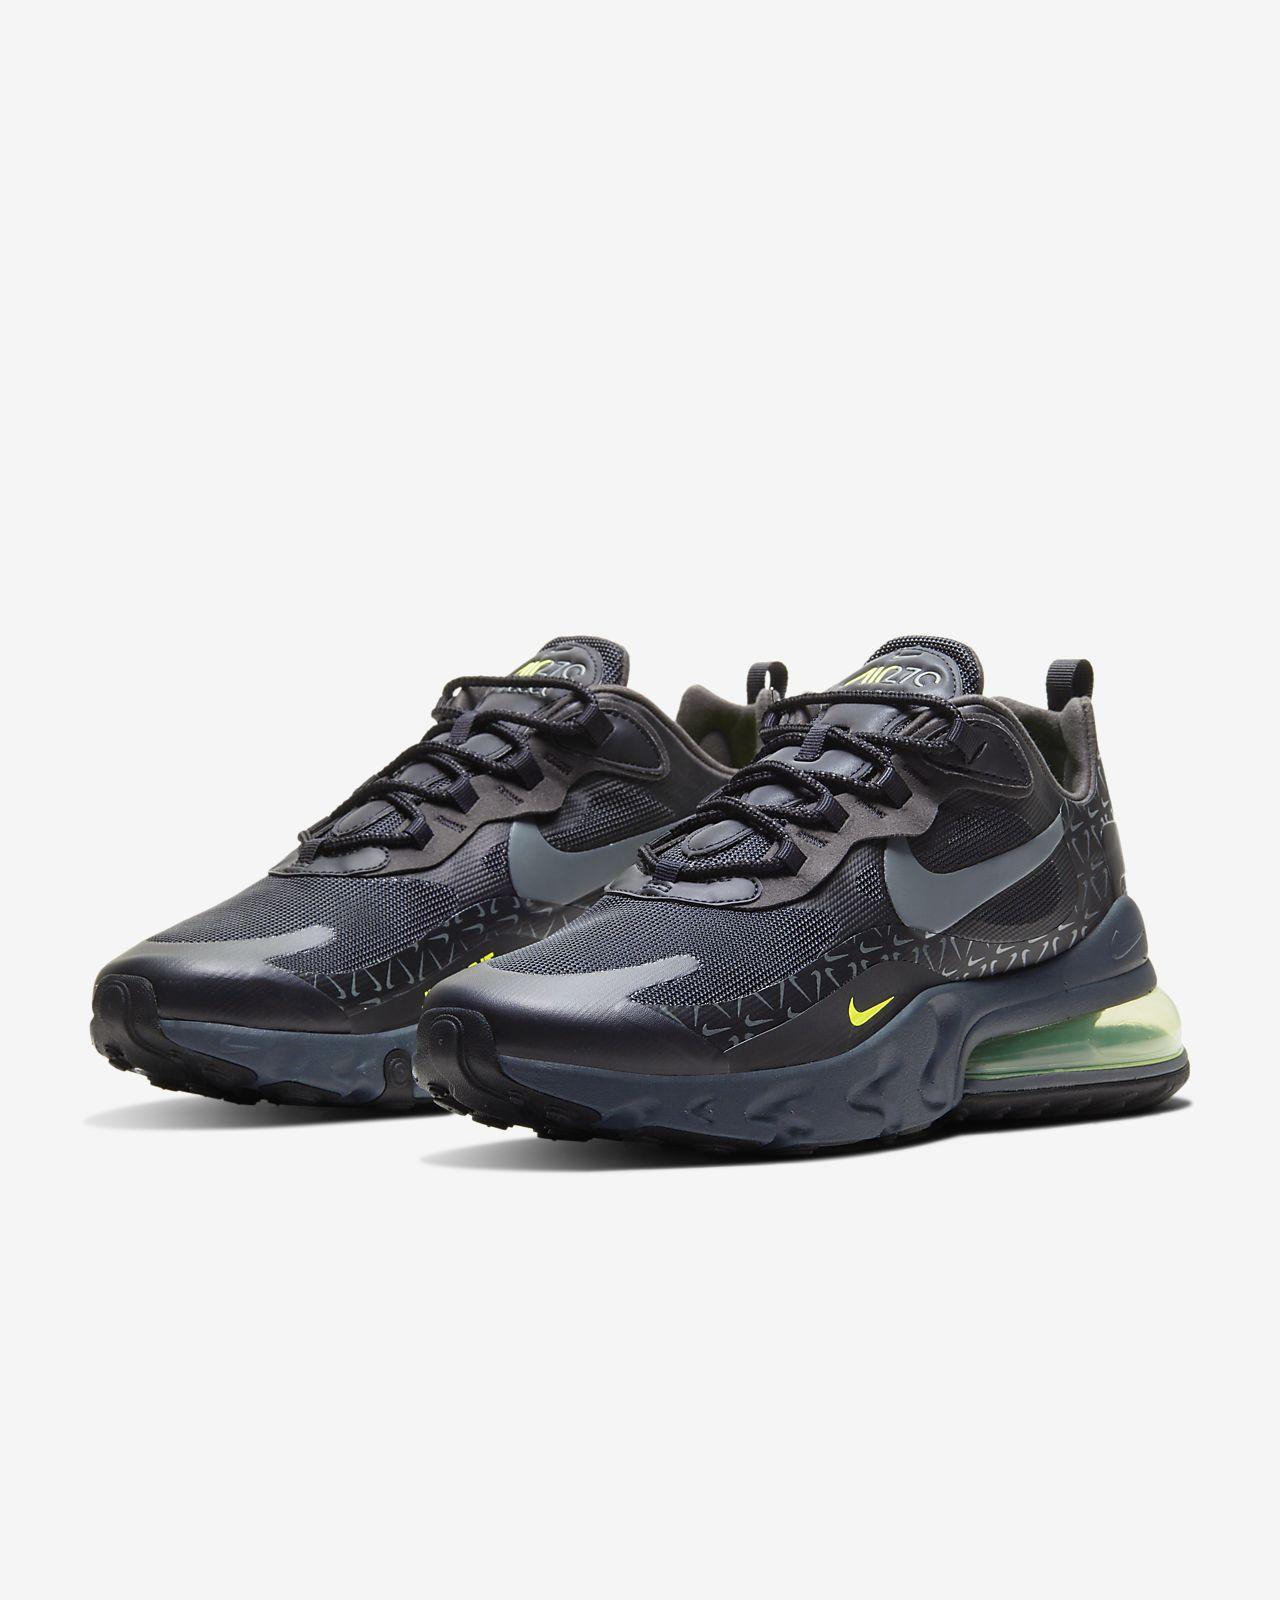 Nike Air Max 270 Futura Herren Laufschuh wolf greywhite dark grey black AO1569 006